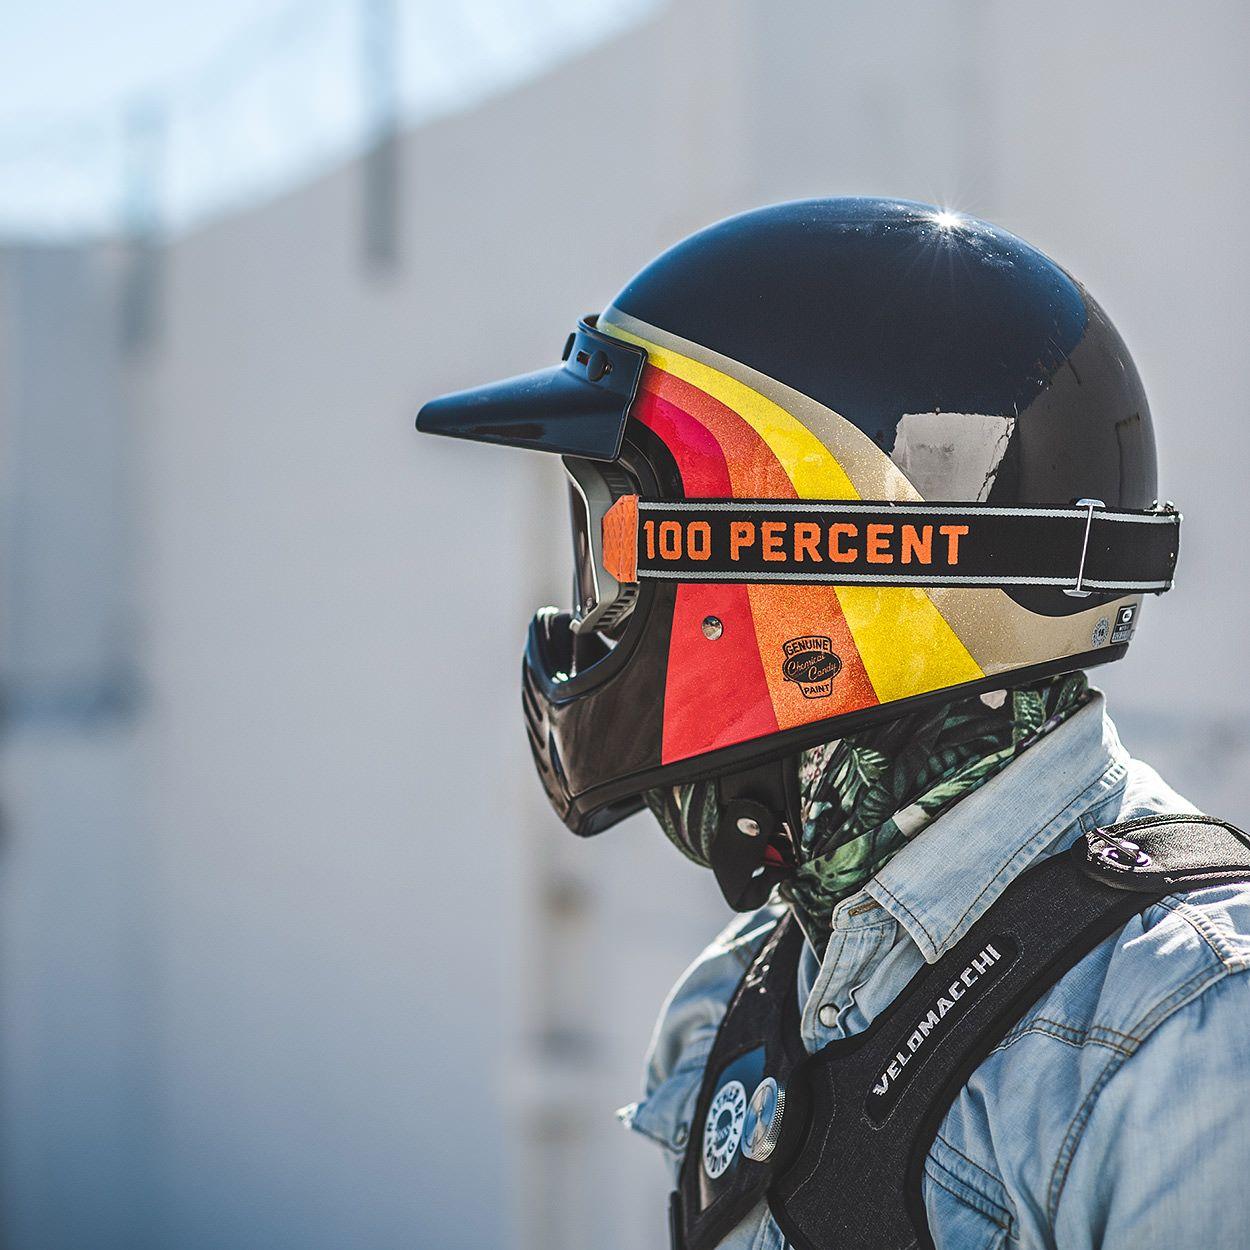 Road Tested The Motorcycle Gear We Wear Cafe Racer Helmet Bell Moto Retro Helmet